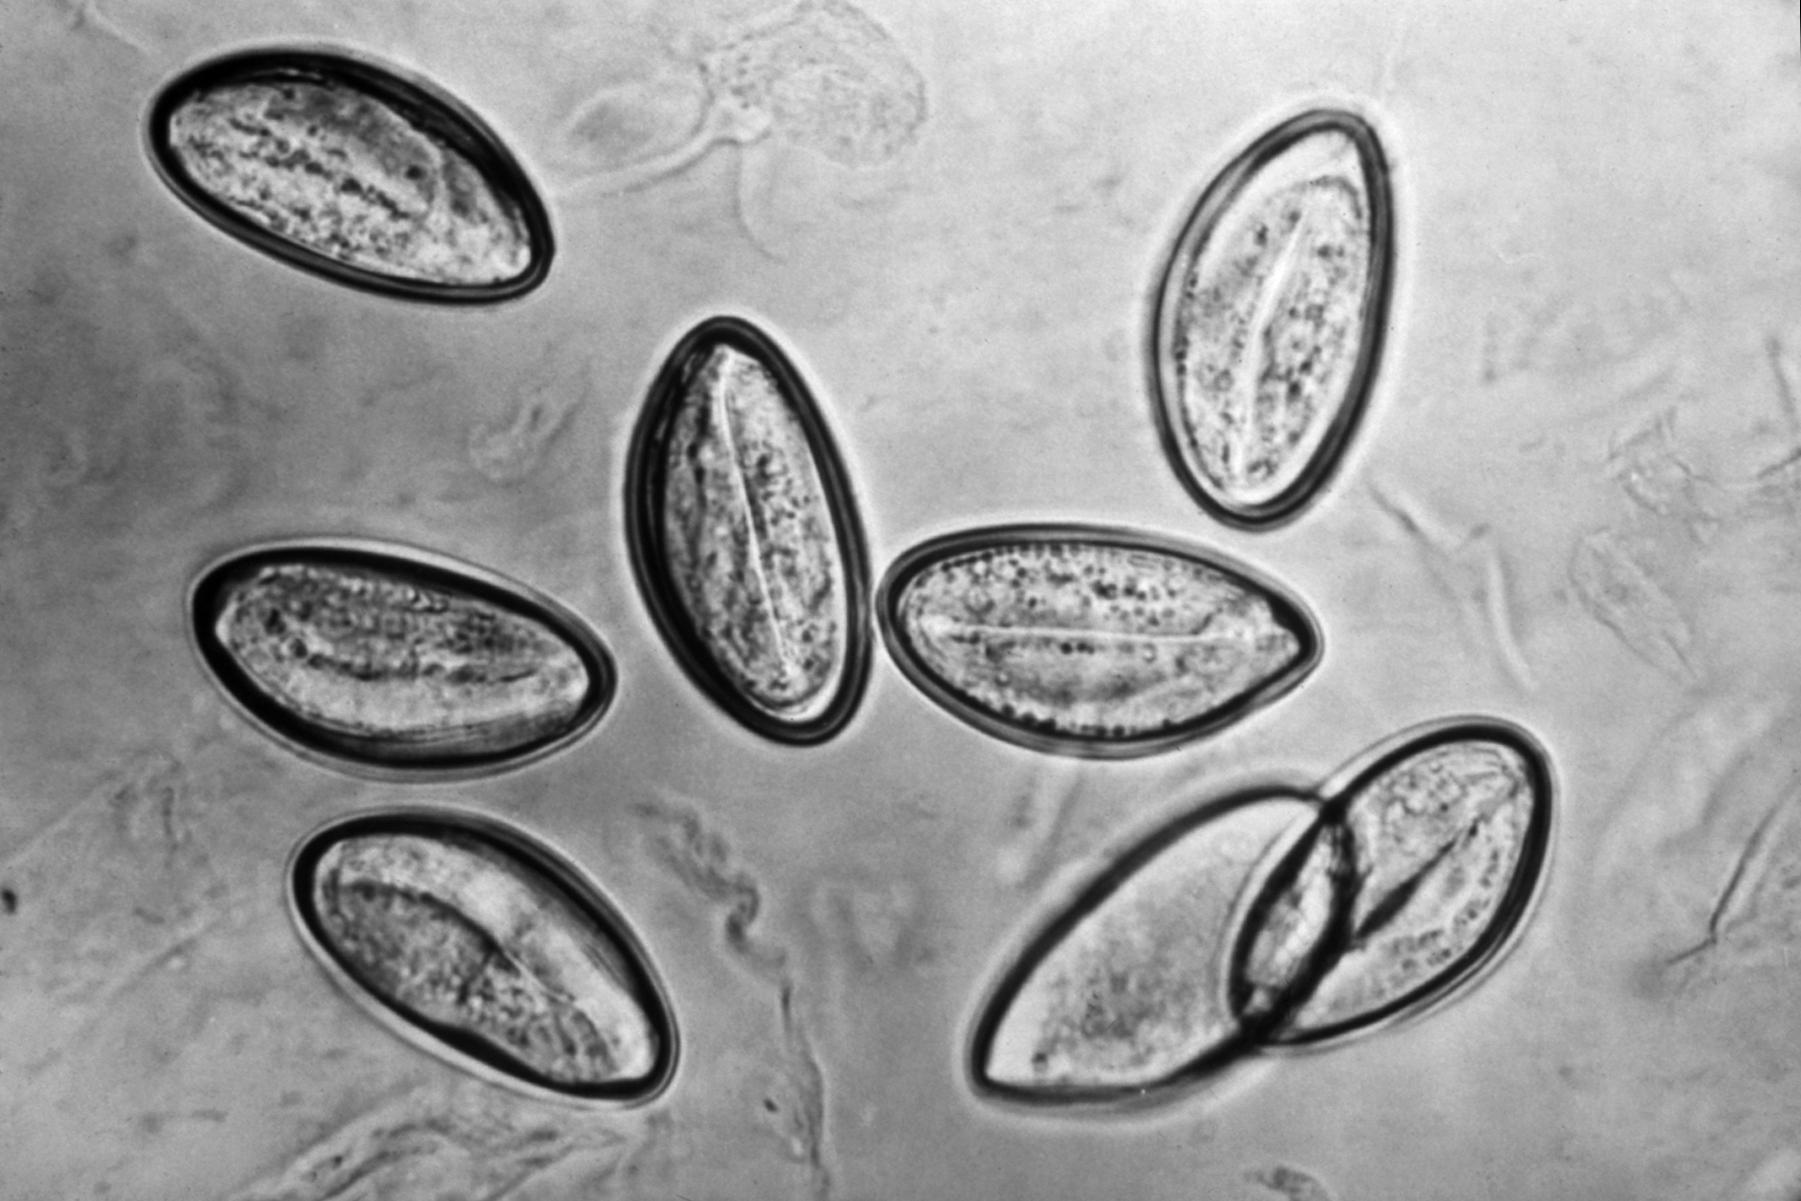 cancer colon urine papillomavirus warzen